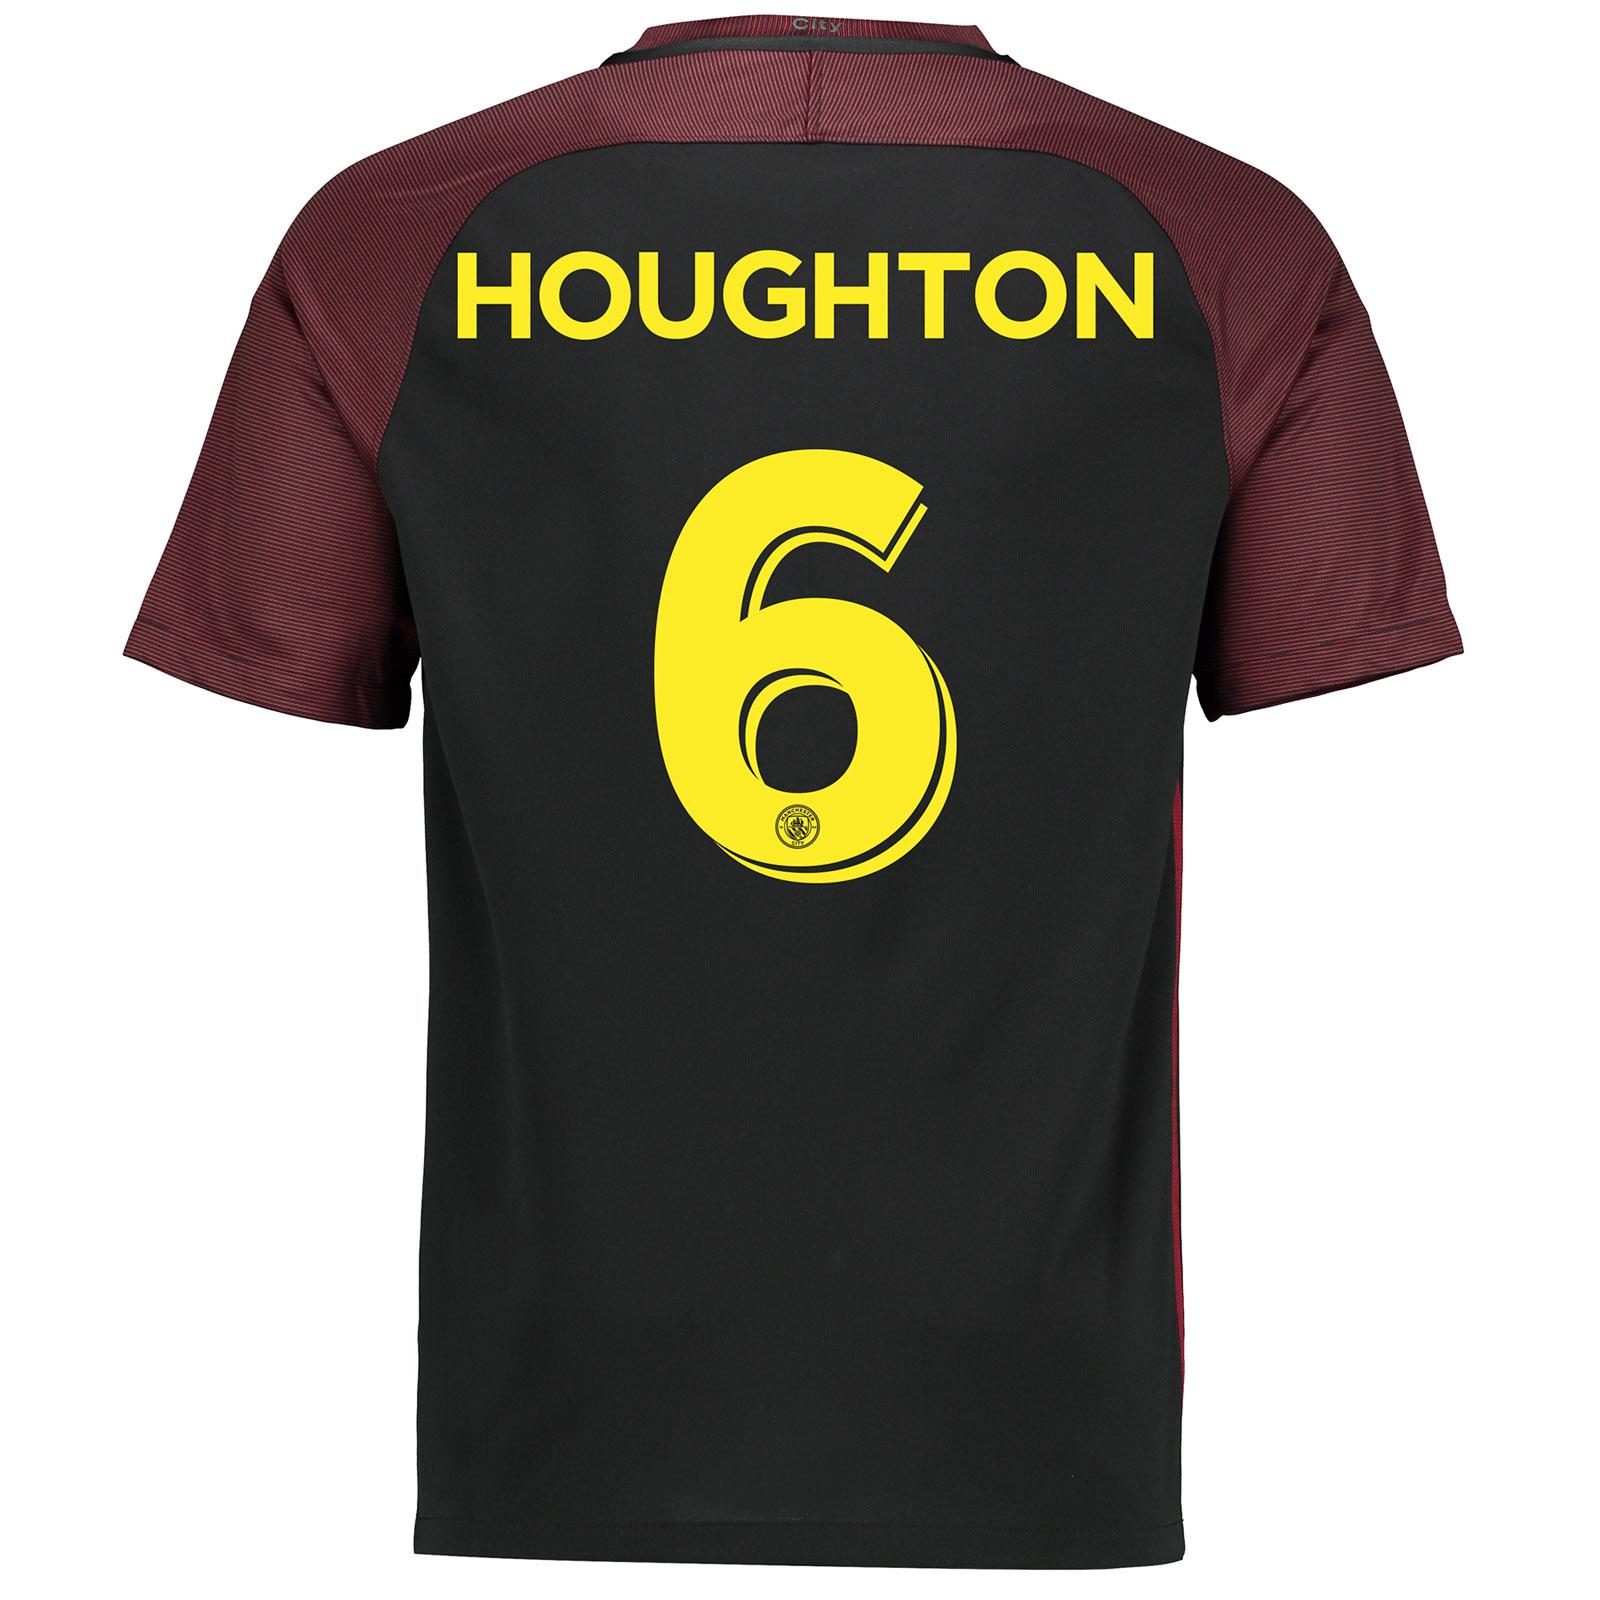 Manchester City Away Cup Stadium Shirt 2016-17 with Houghton 6 printin